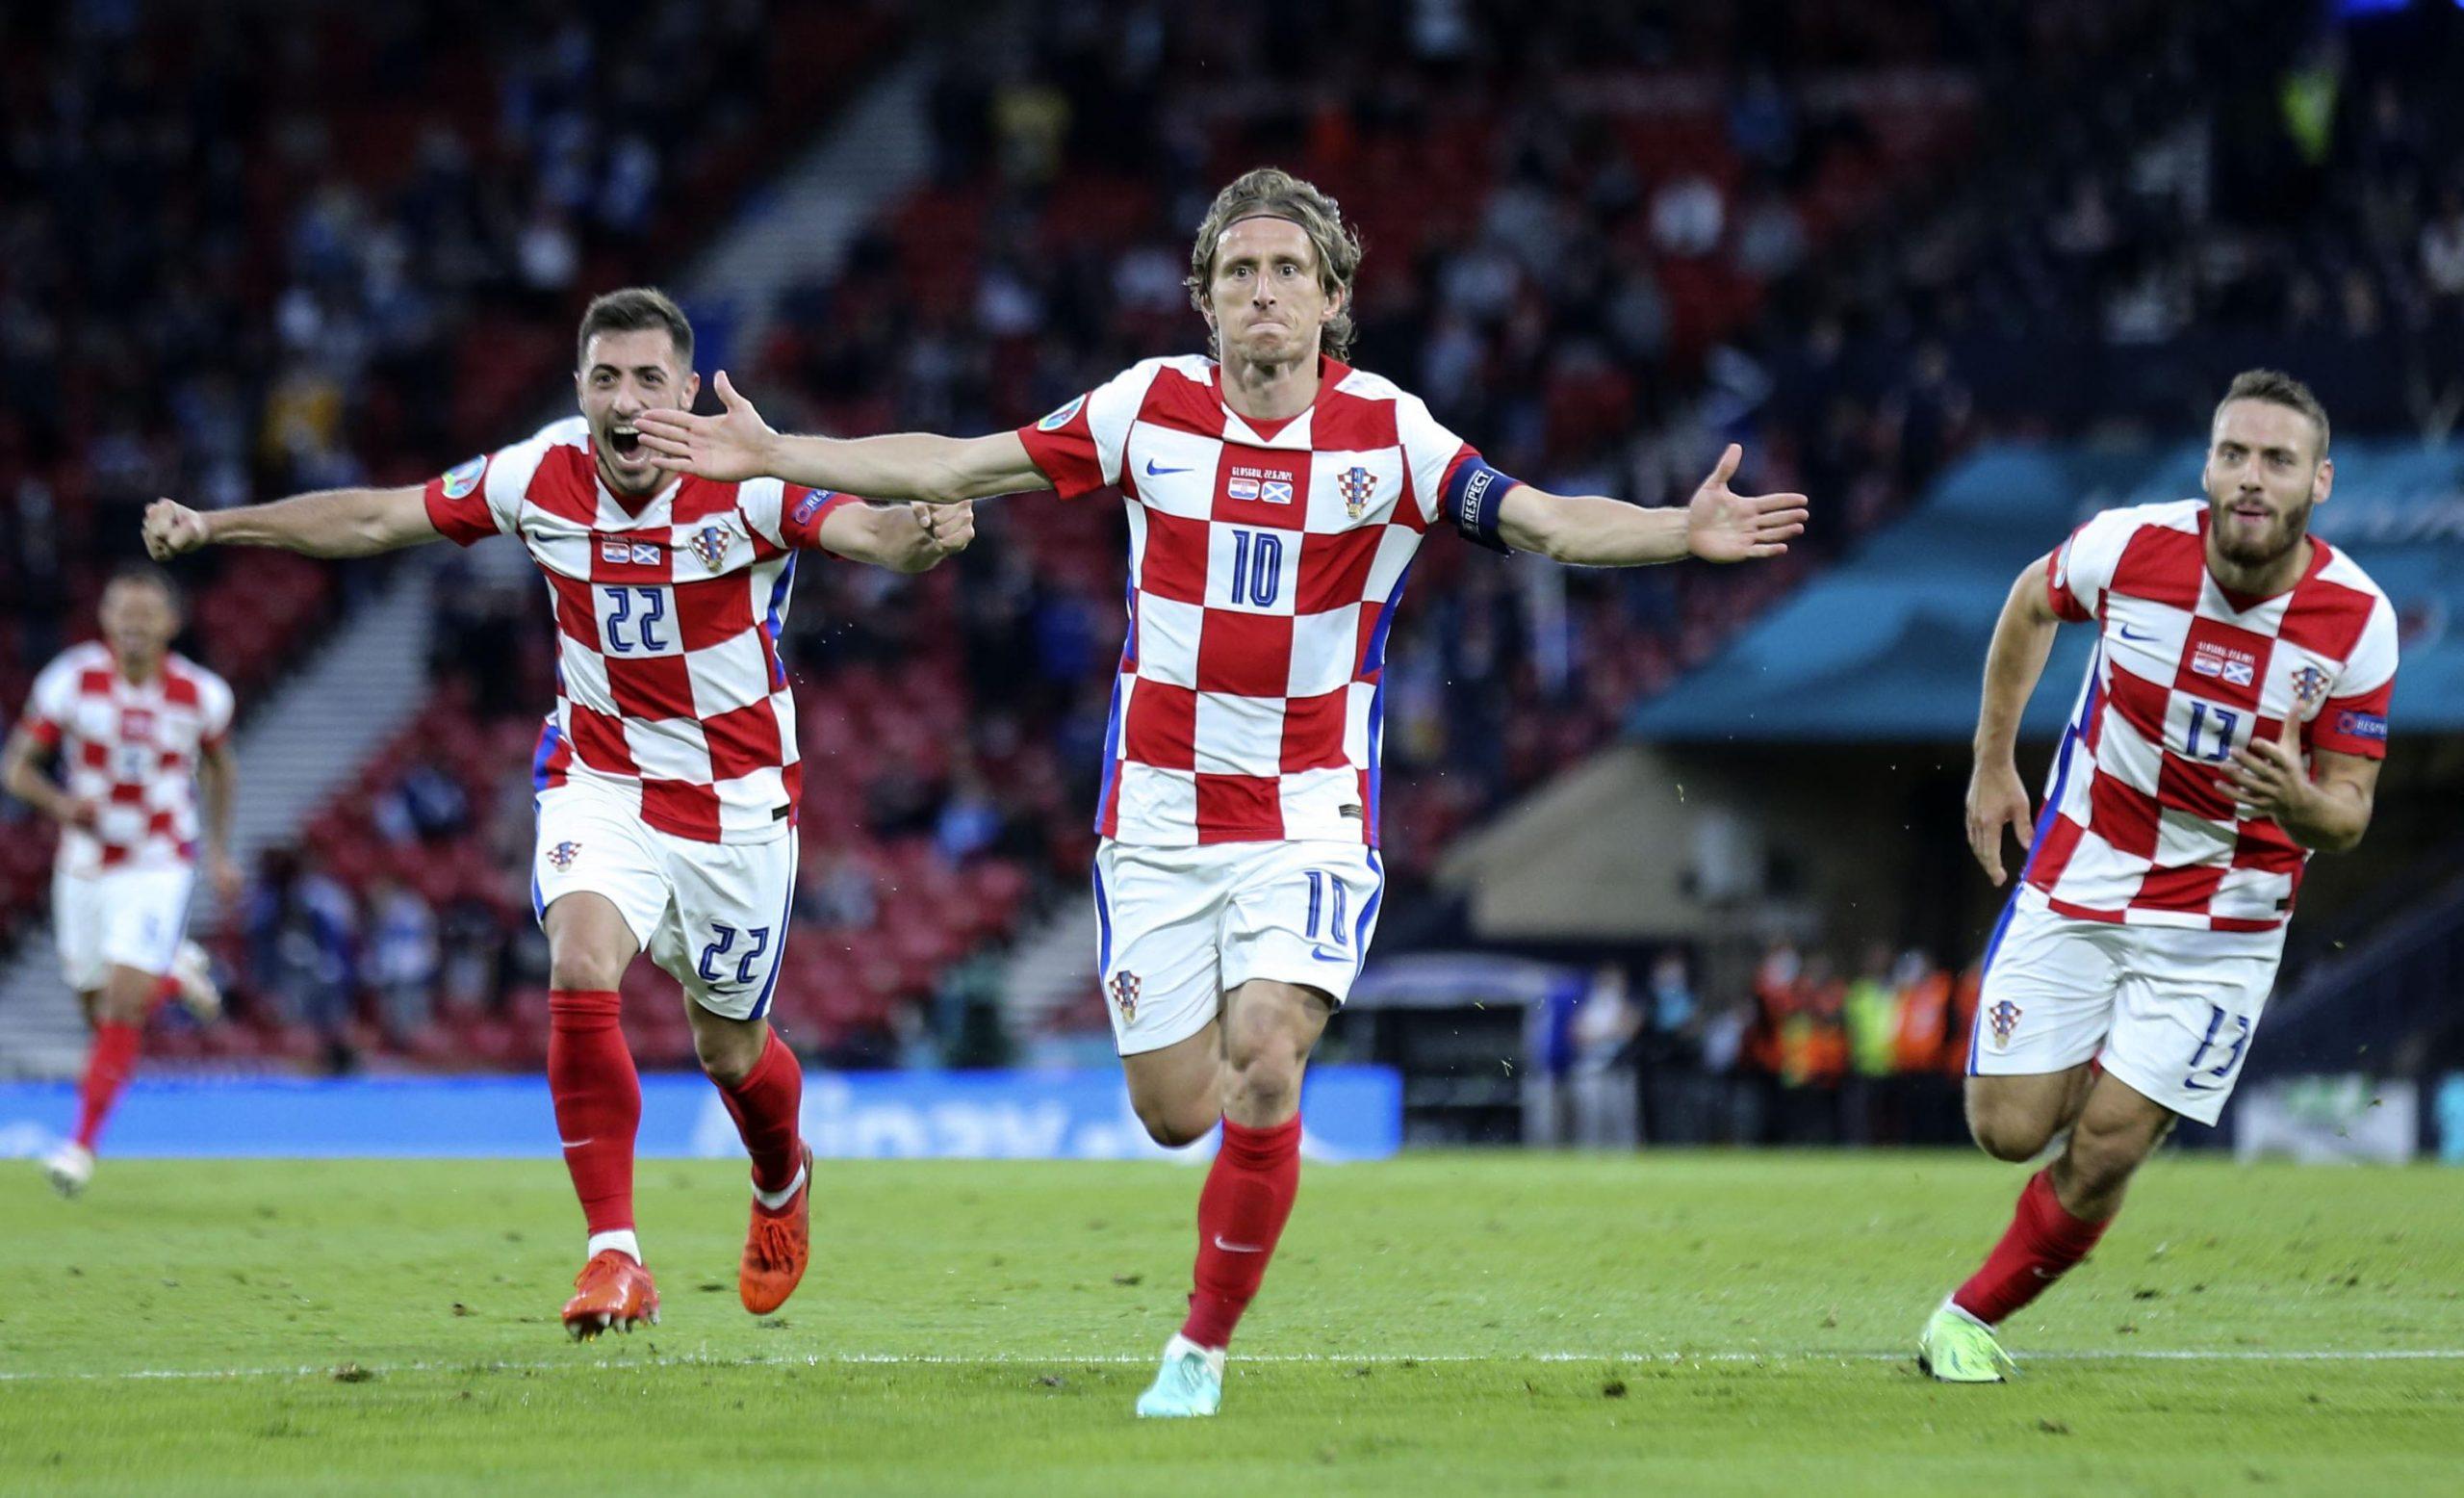 Croatia advances at Euro 2020 with Modrić leading the way